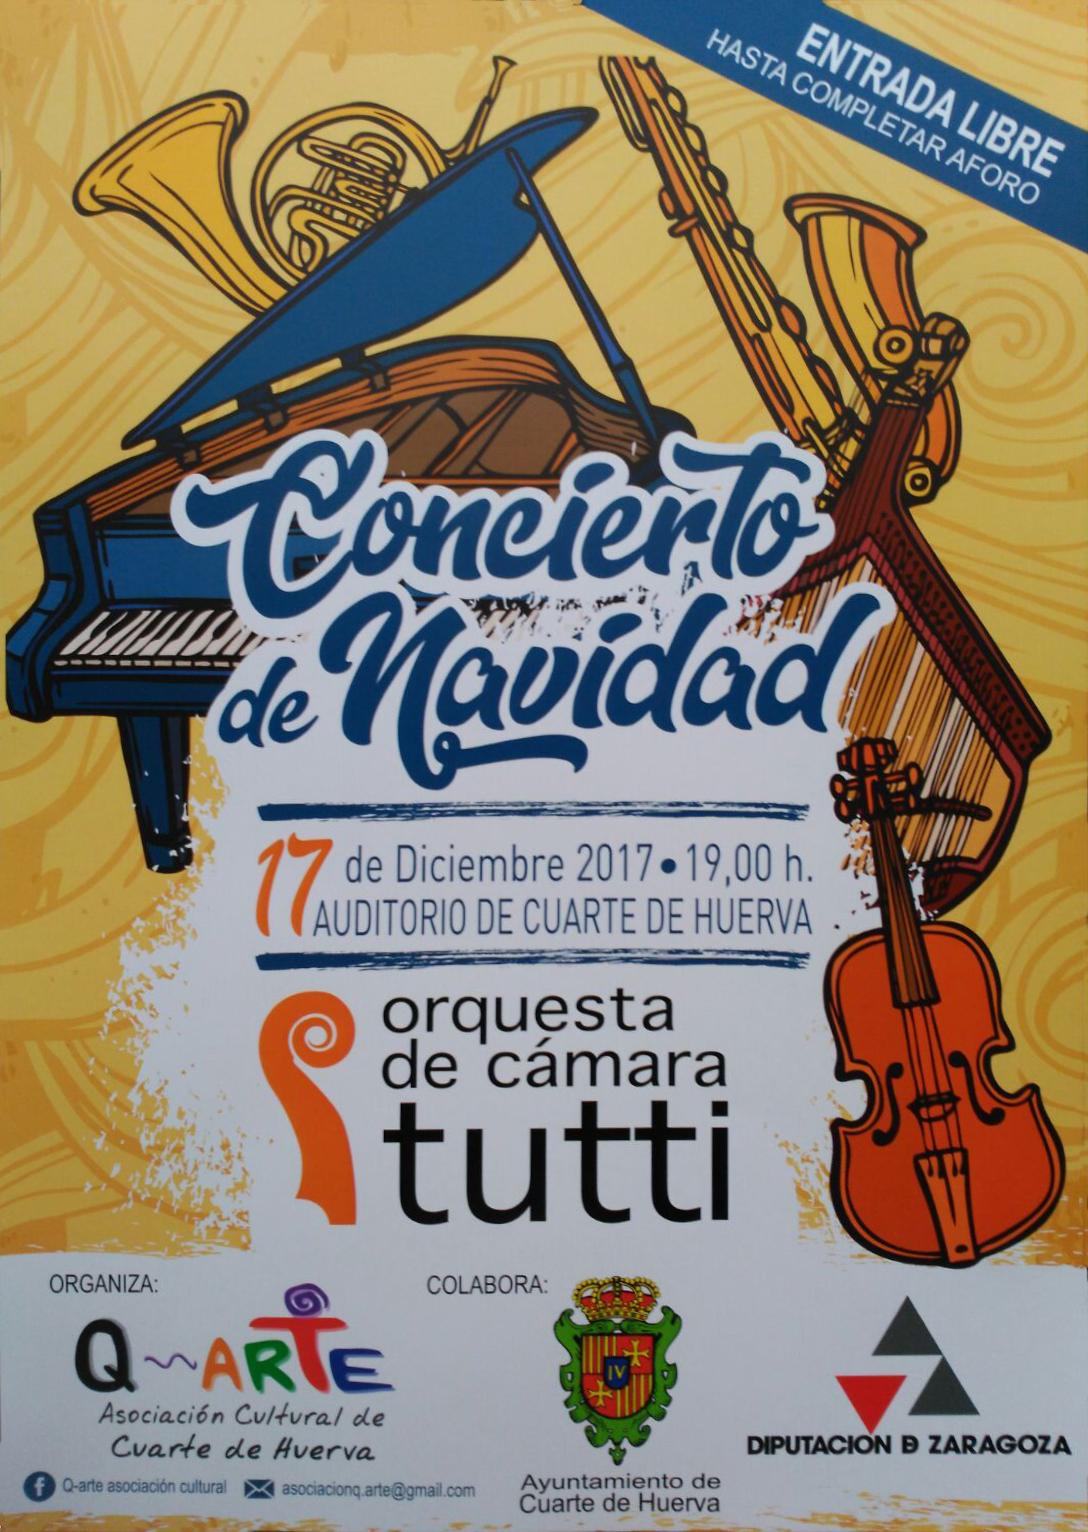 http://orquestatutti.com/wp/wp-content/uploads/2017/12/Cartel-Cuarte.jpg